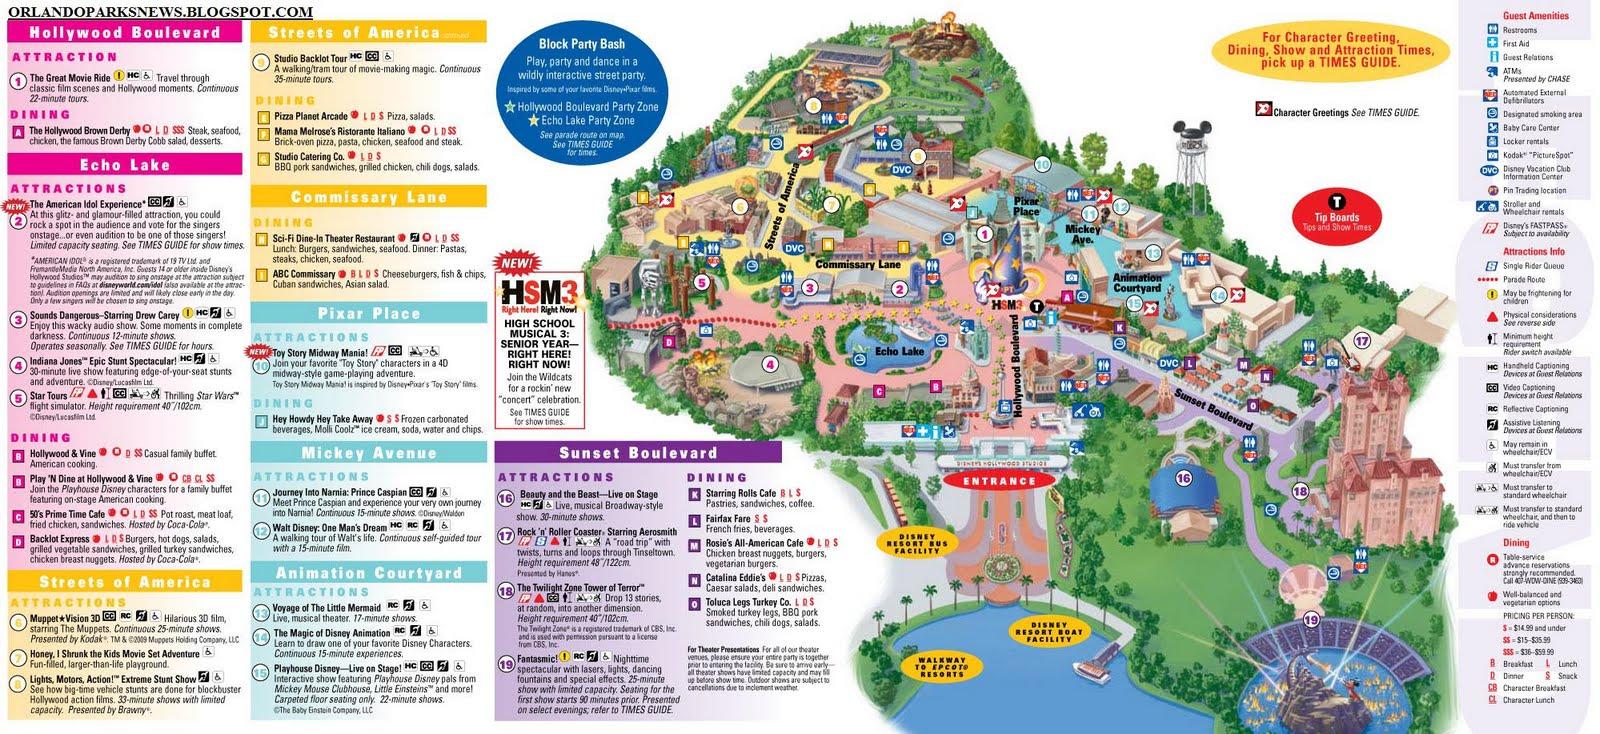 Disney\'s Hollywood Studios park map - Orlando Theme Park News